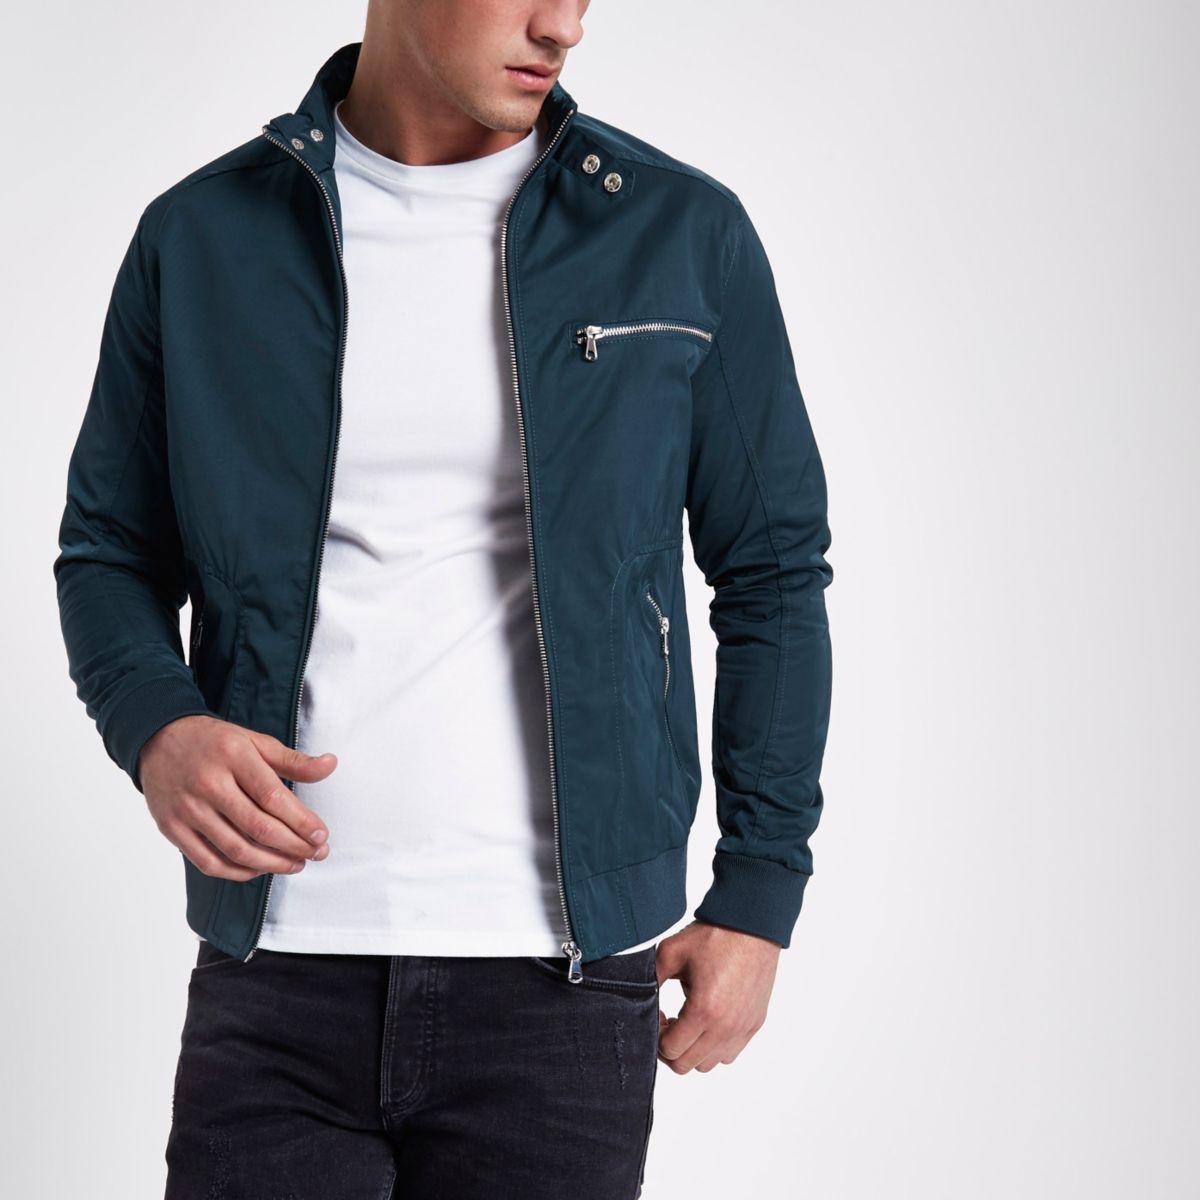 Dark turquoise racer neck jacket